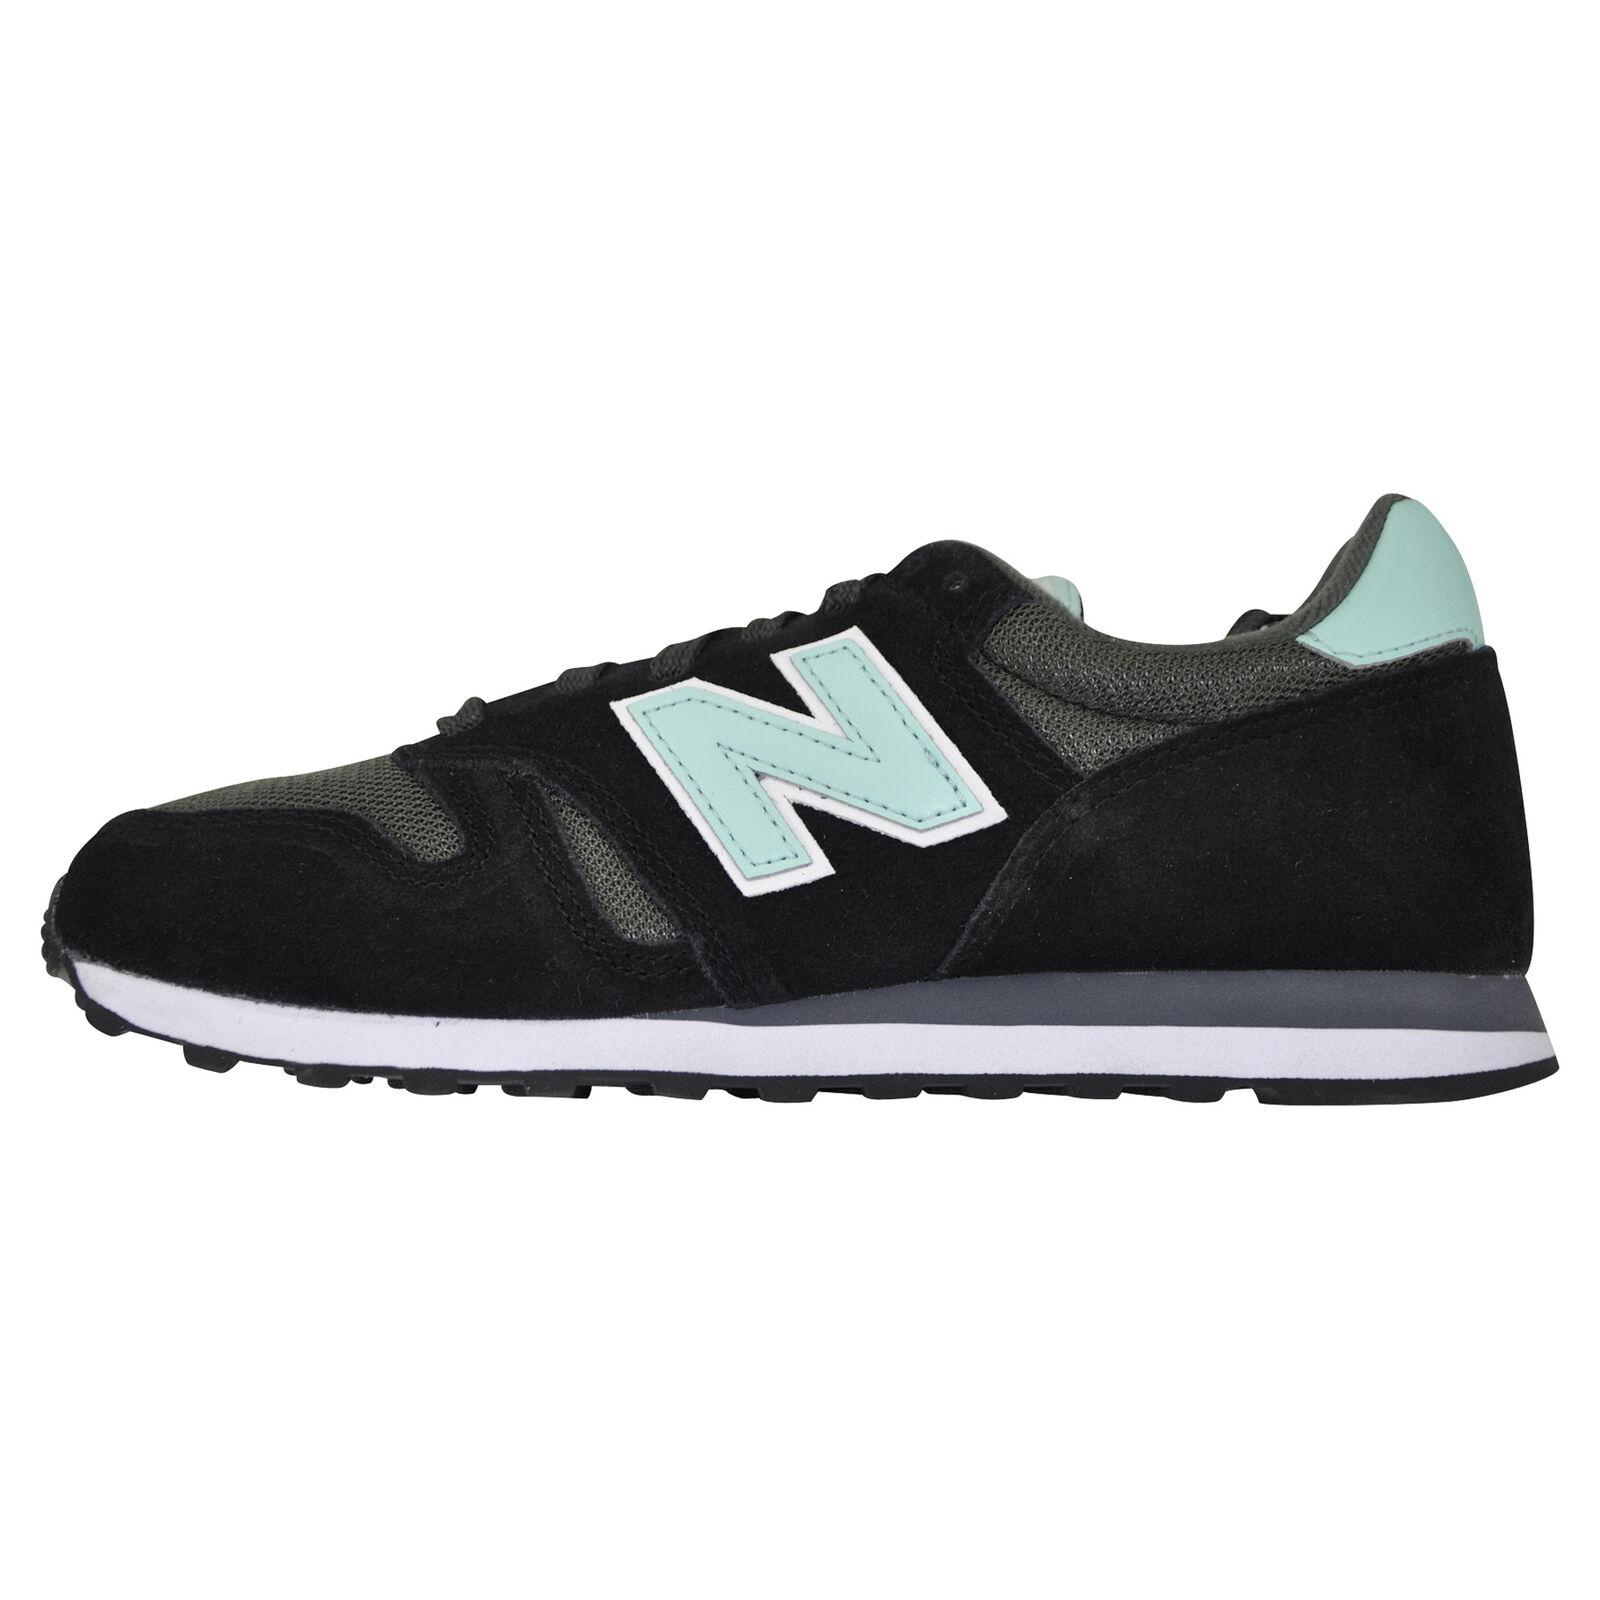 NEW deporte BALANCE WL373SKM Ocio Para Correr Jogging Zapatillas de deporte NEW Zapatos 22532c